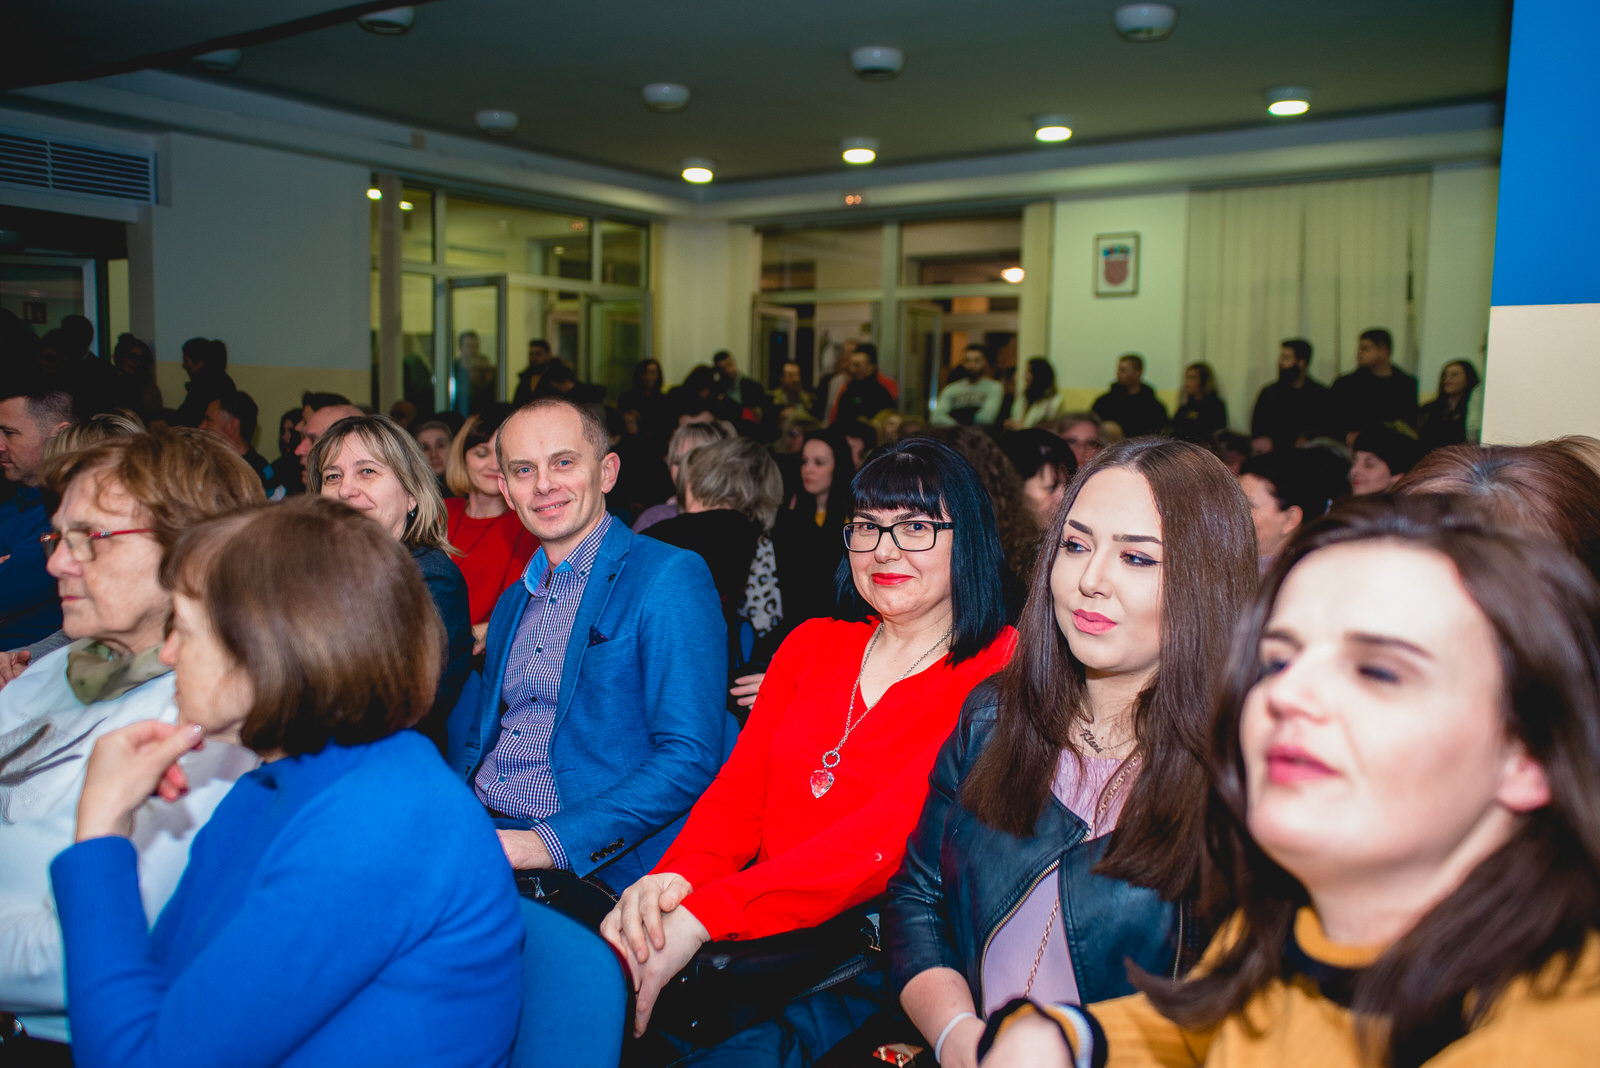 likaclub_koncert-klapa-cambi_kic-gospić_2019-5